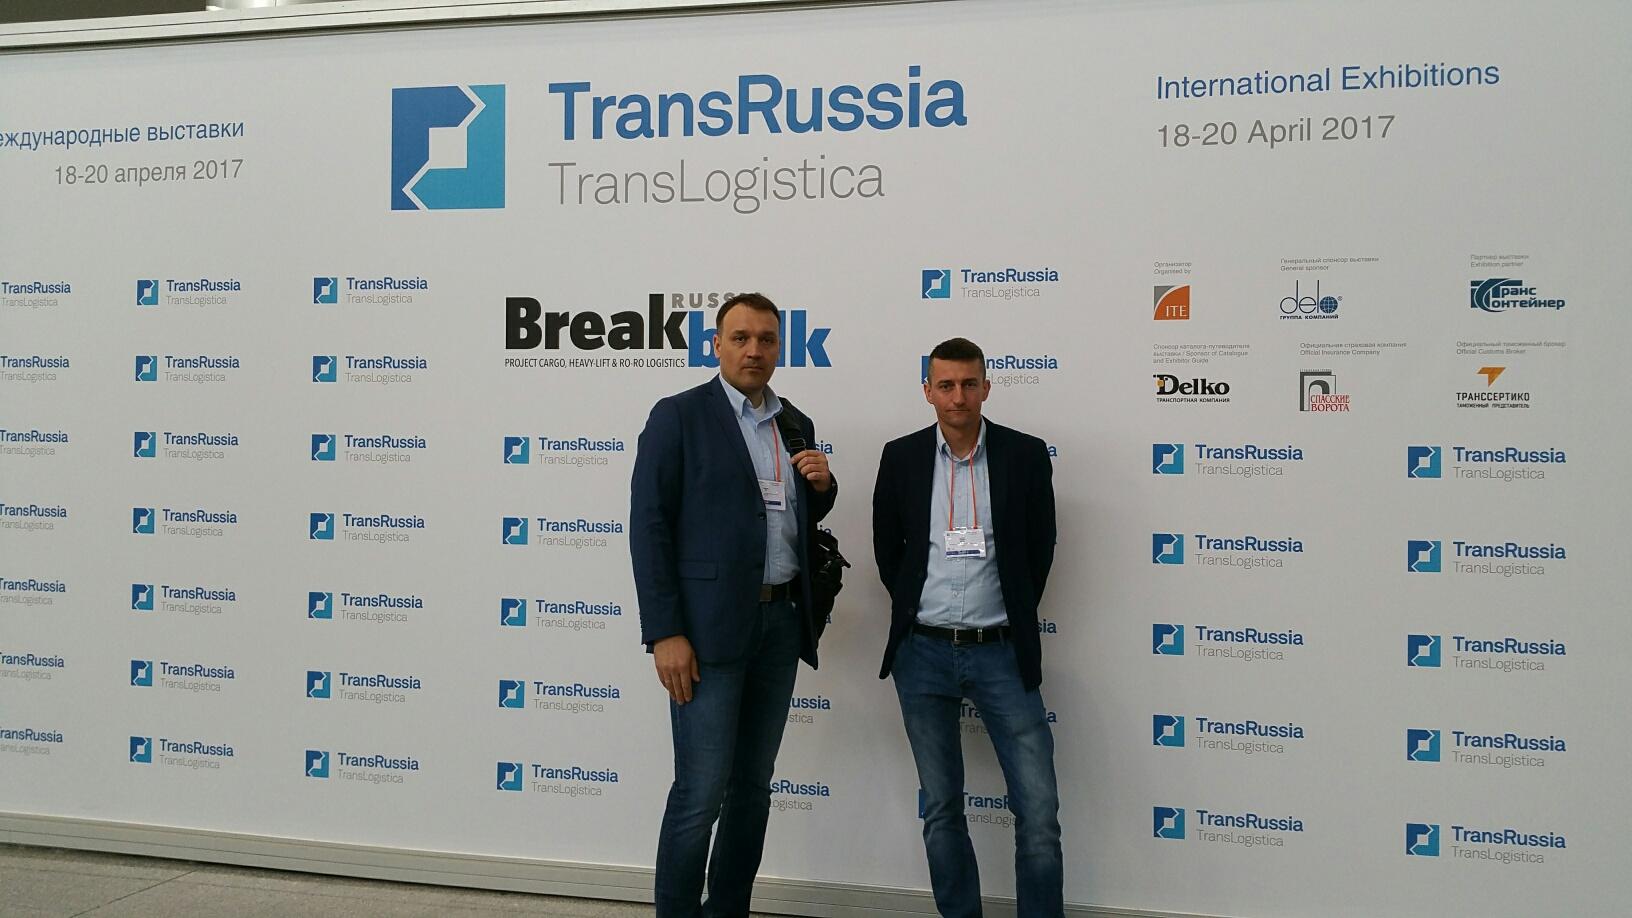 Nasi handlowcy na targach Trans Russia - KM Import